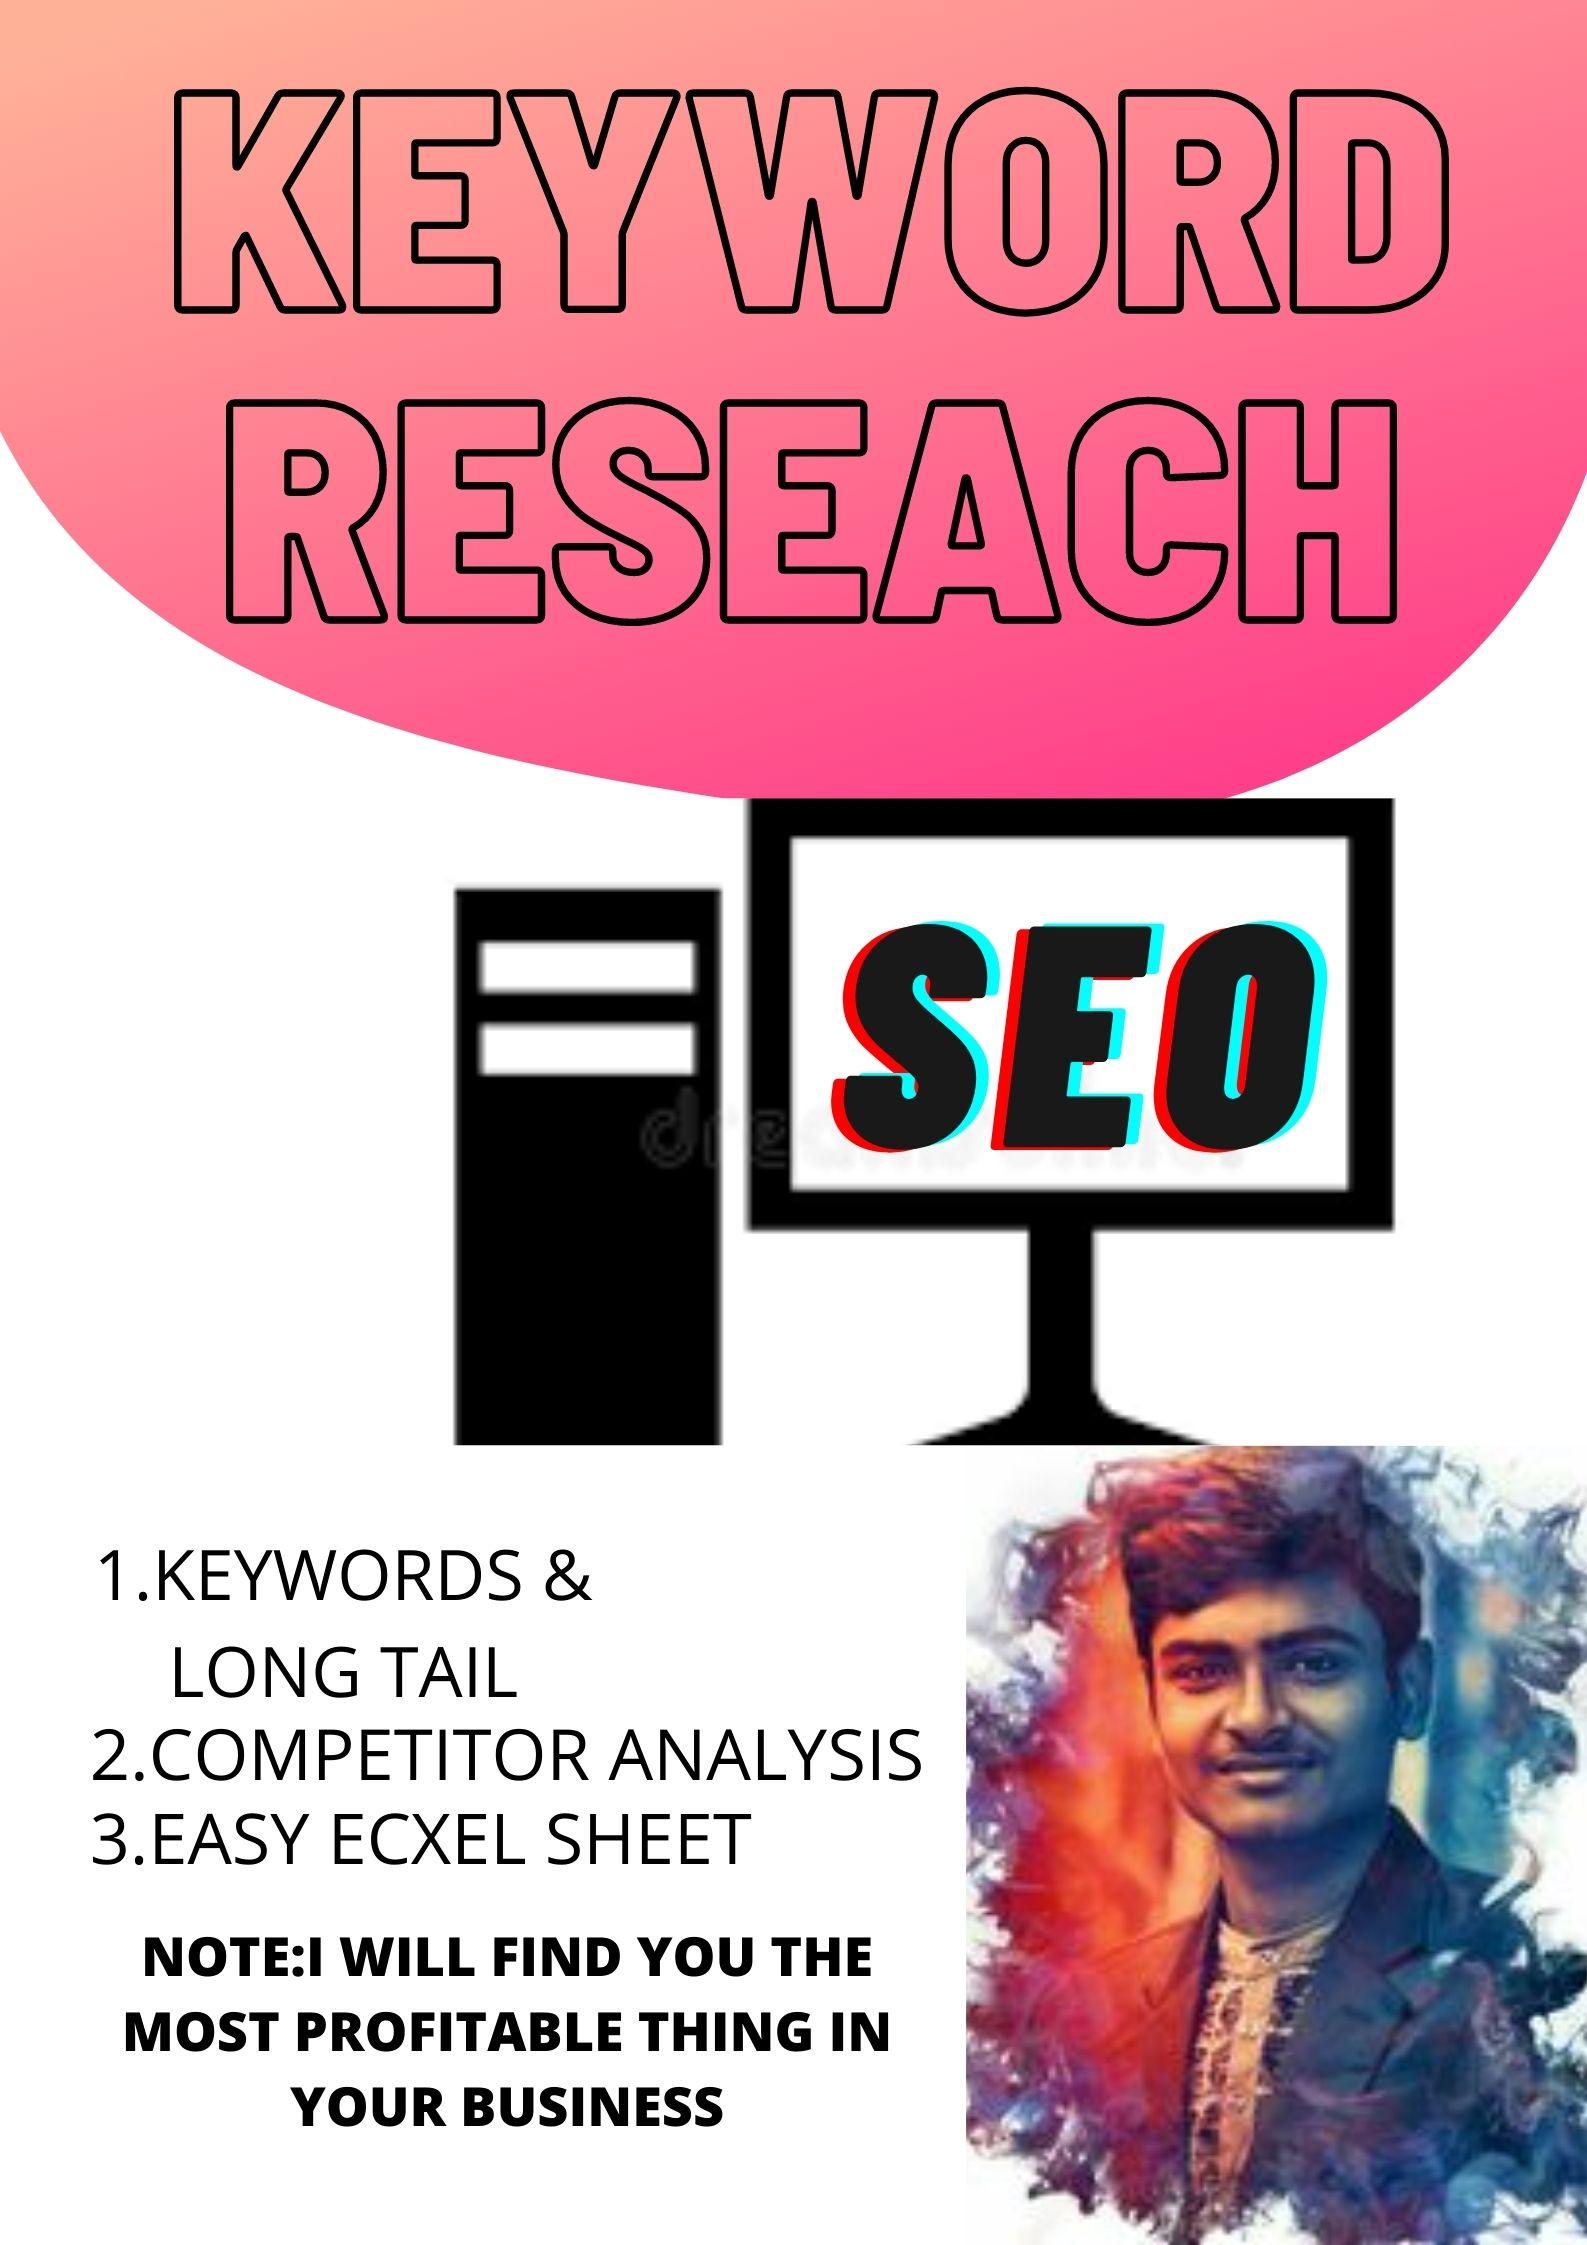 I will do SEO keywords reseach & competitor analysis.